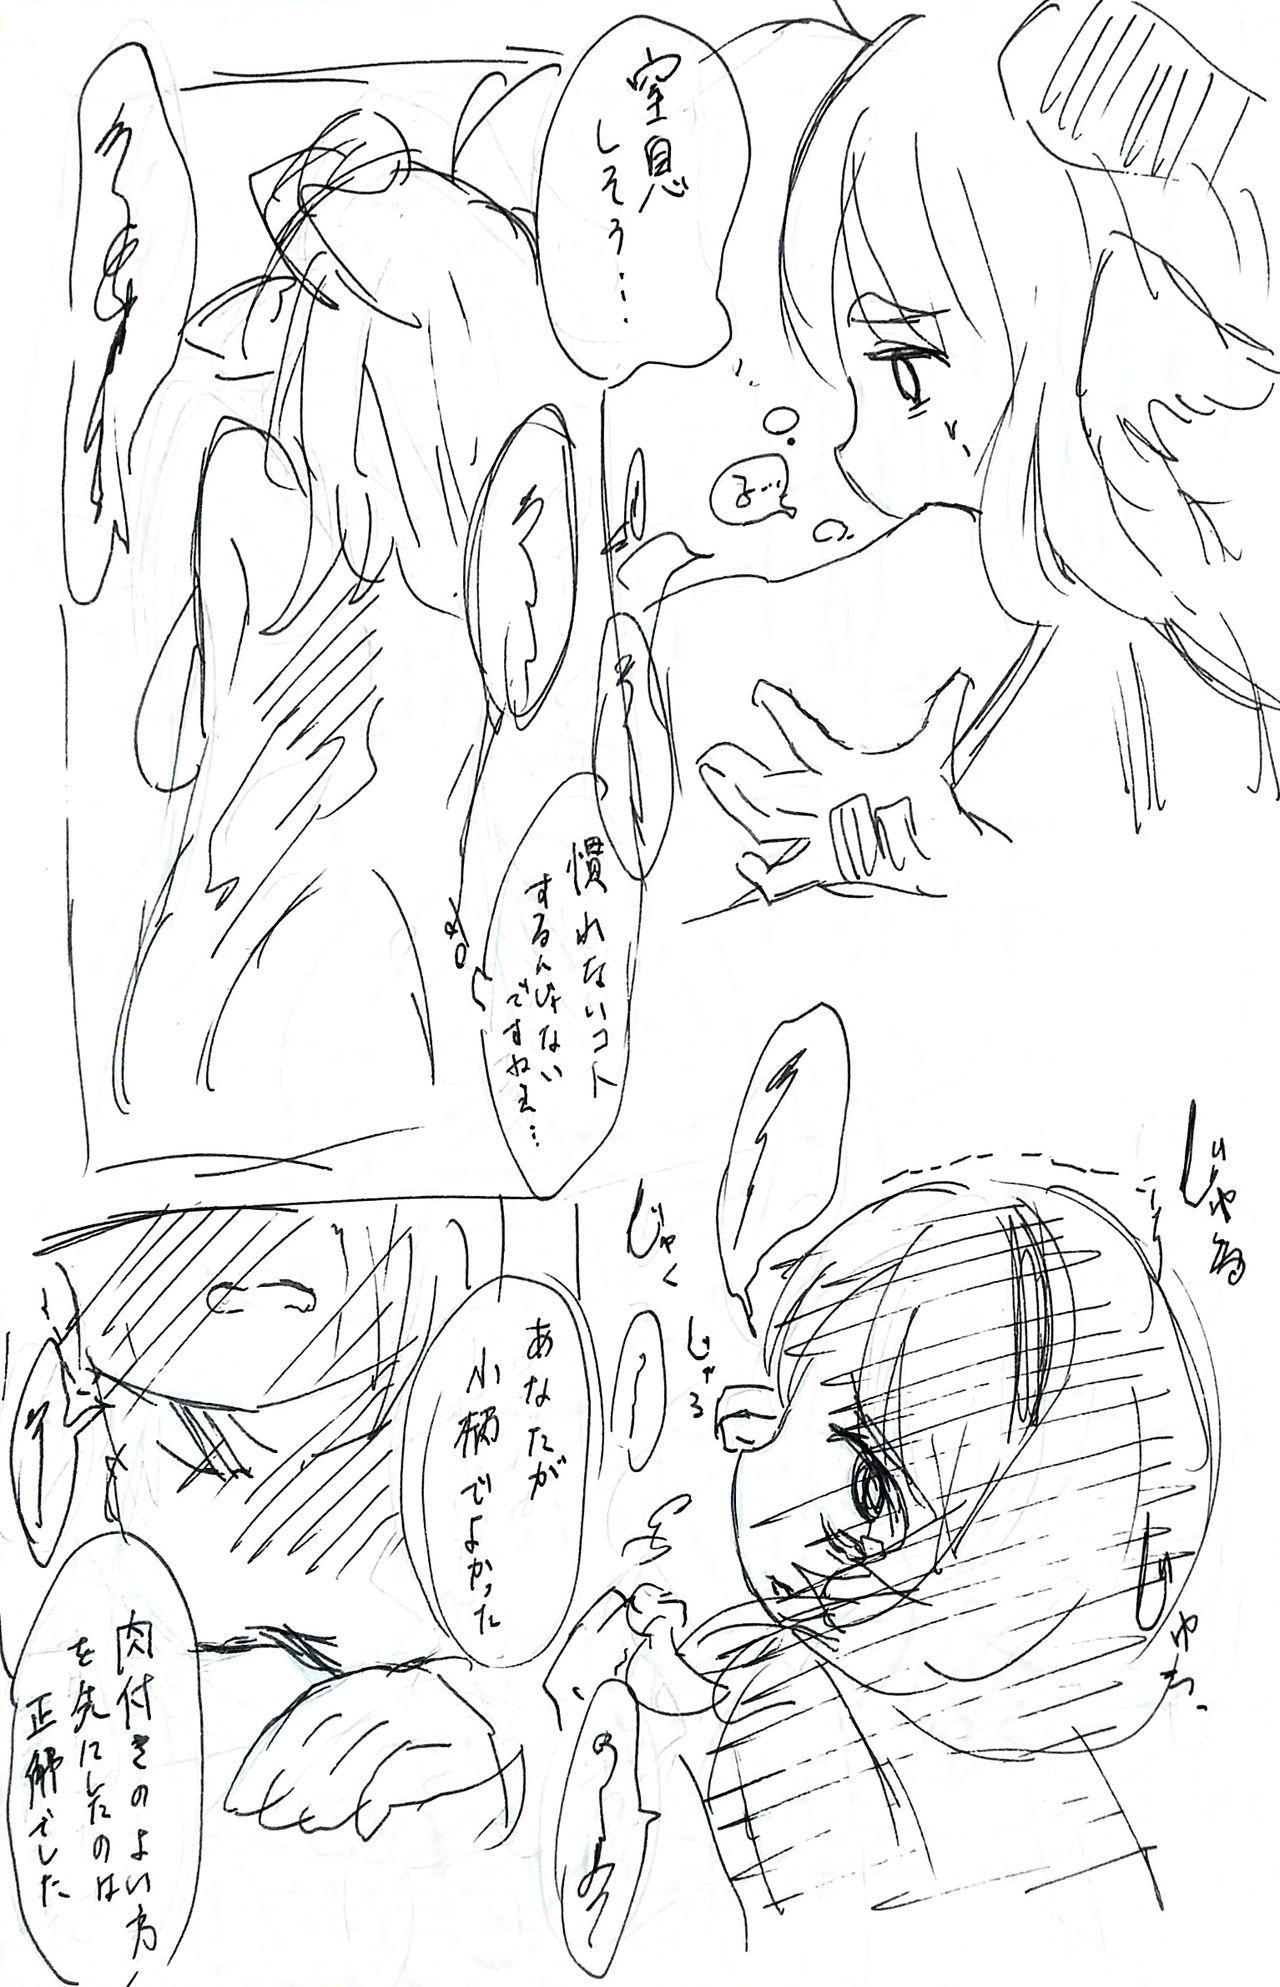 Hisui-chan carnival biyori 8